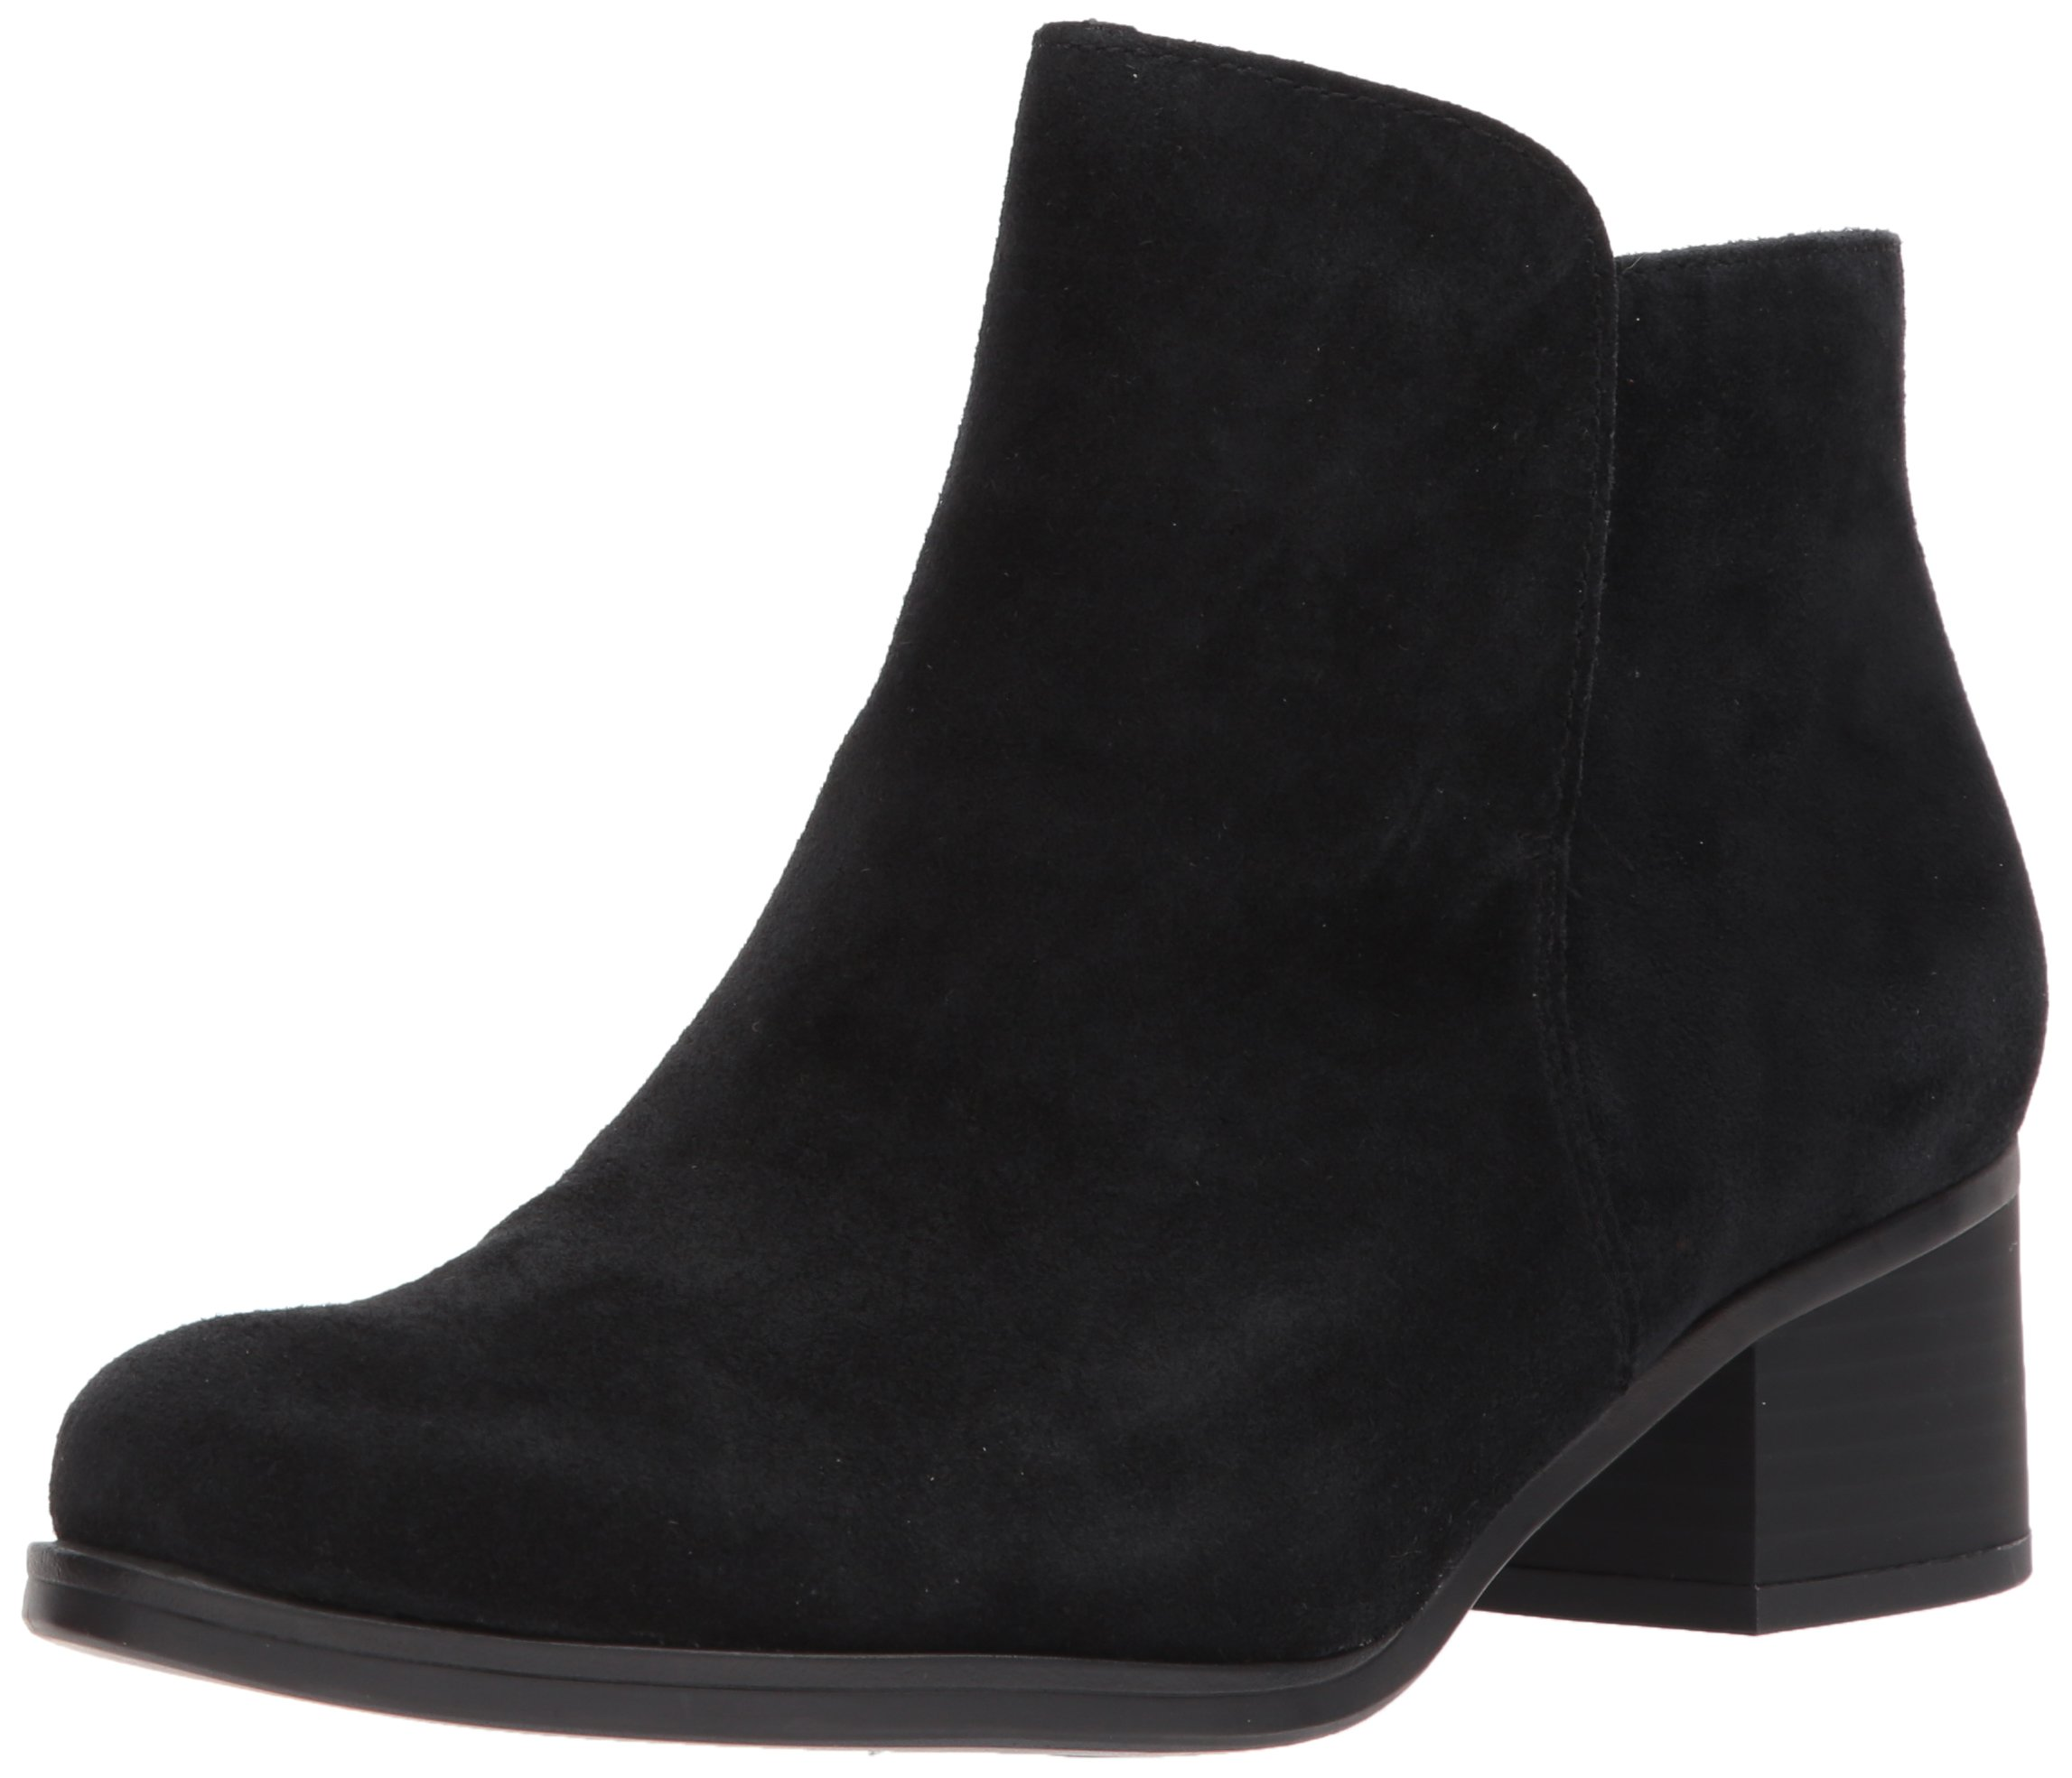 Naturalizer Women's Dawson Chelsea Boot, Black Suede, 6 Medium US